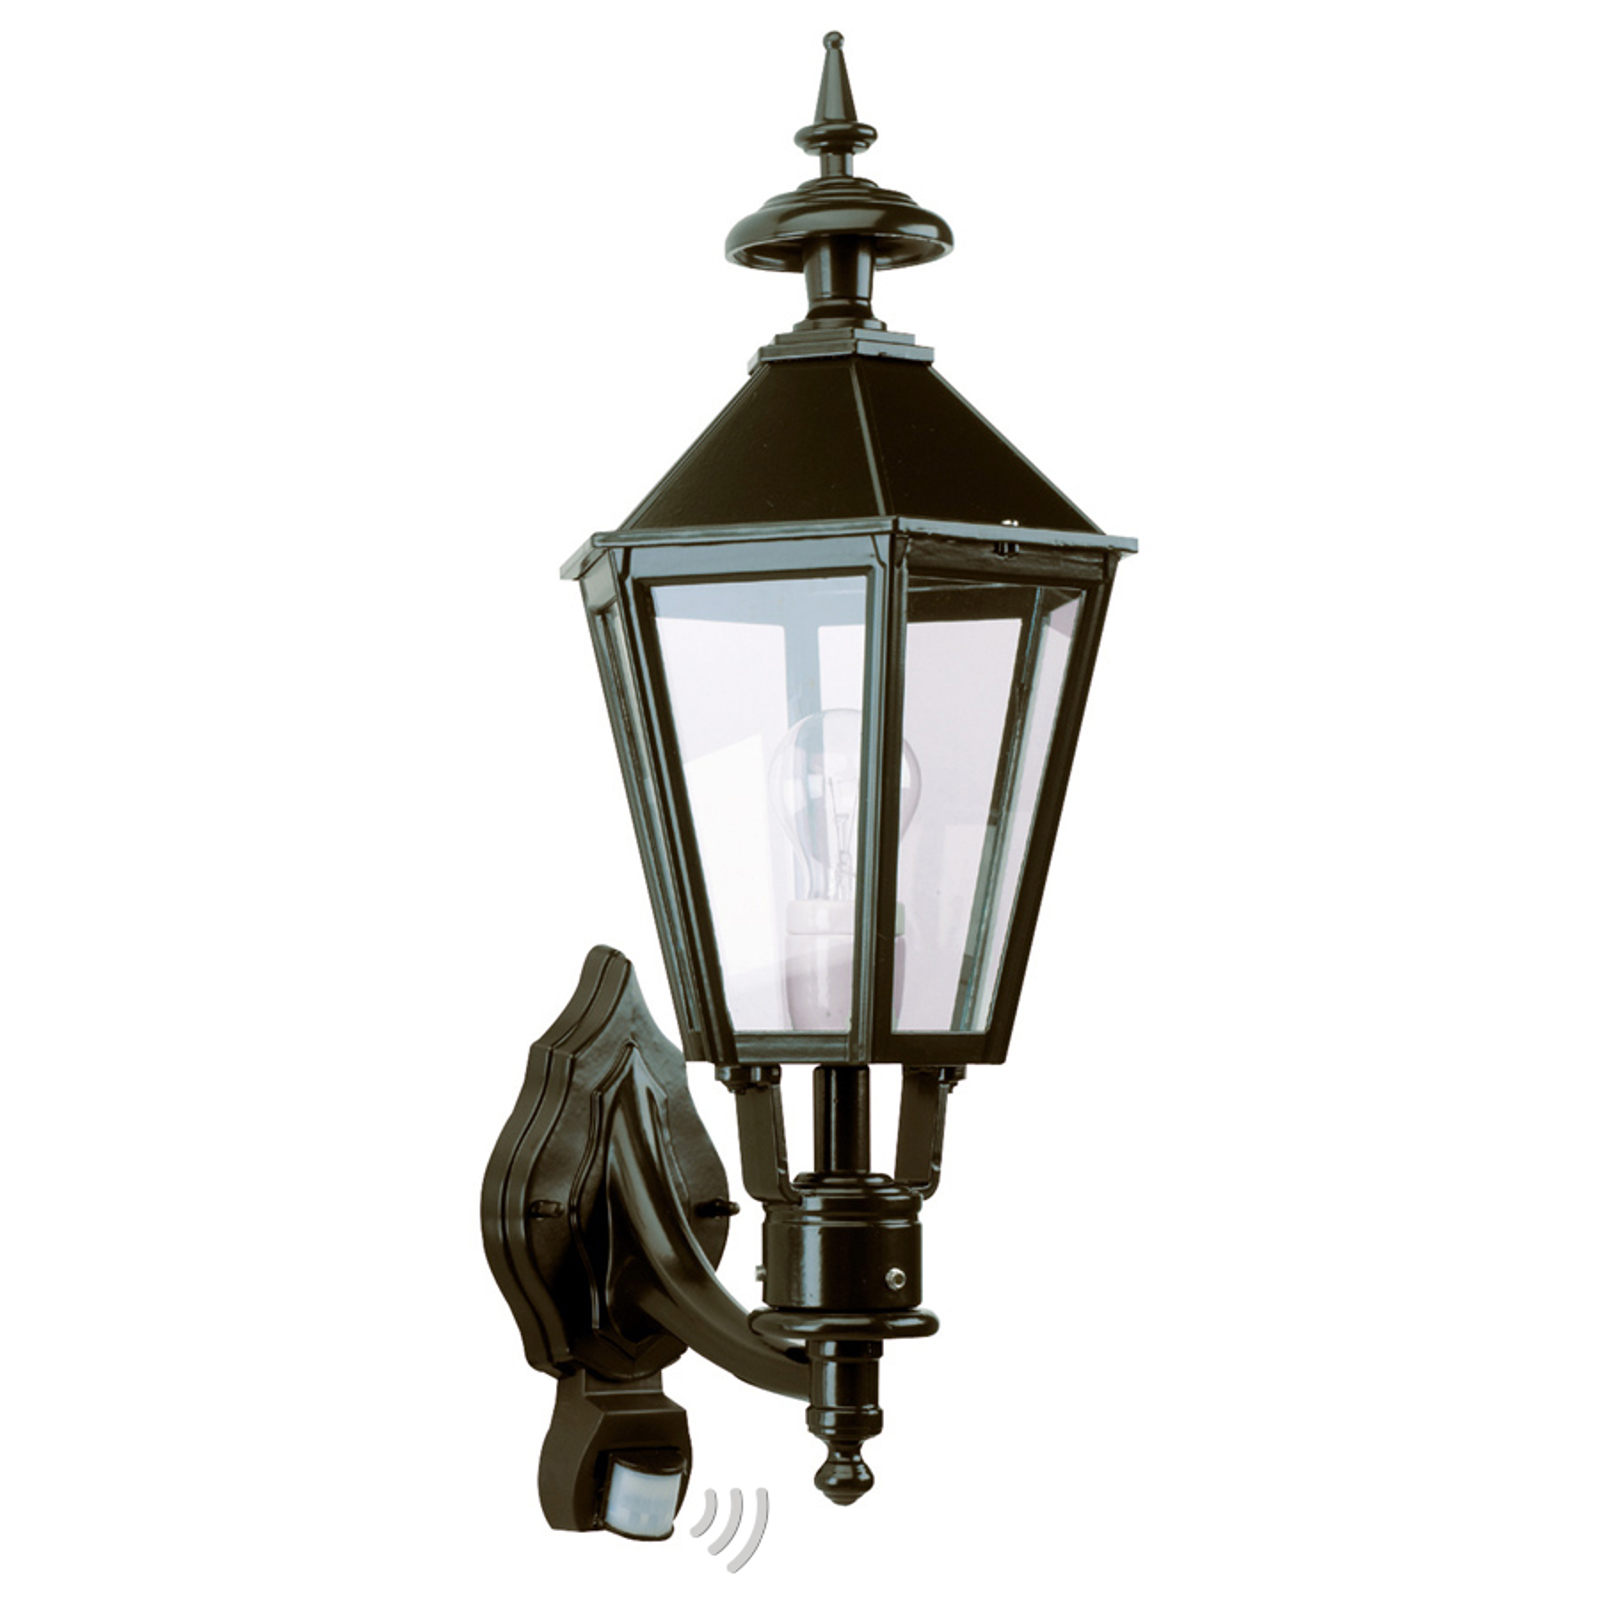 Buitenwandlamp Bolton, groen